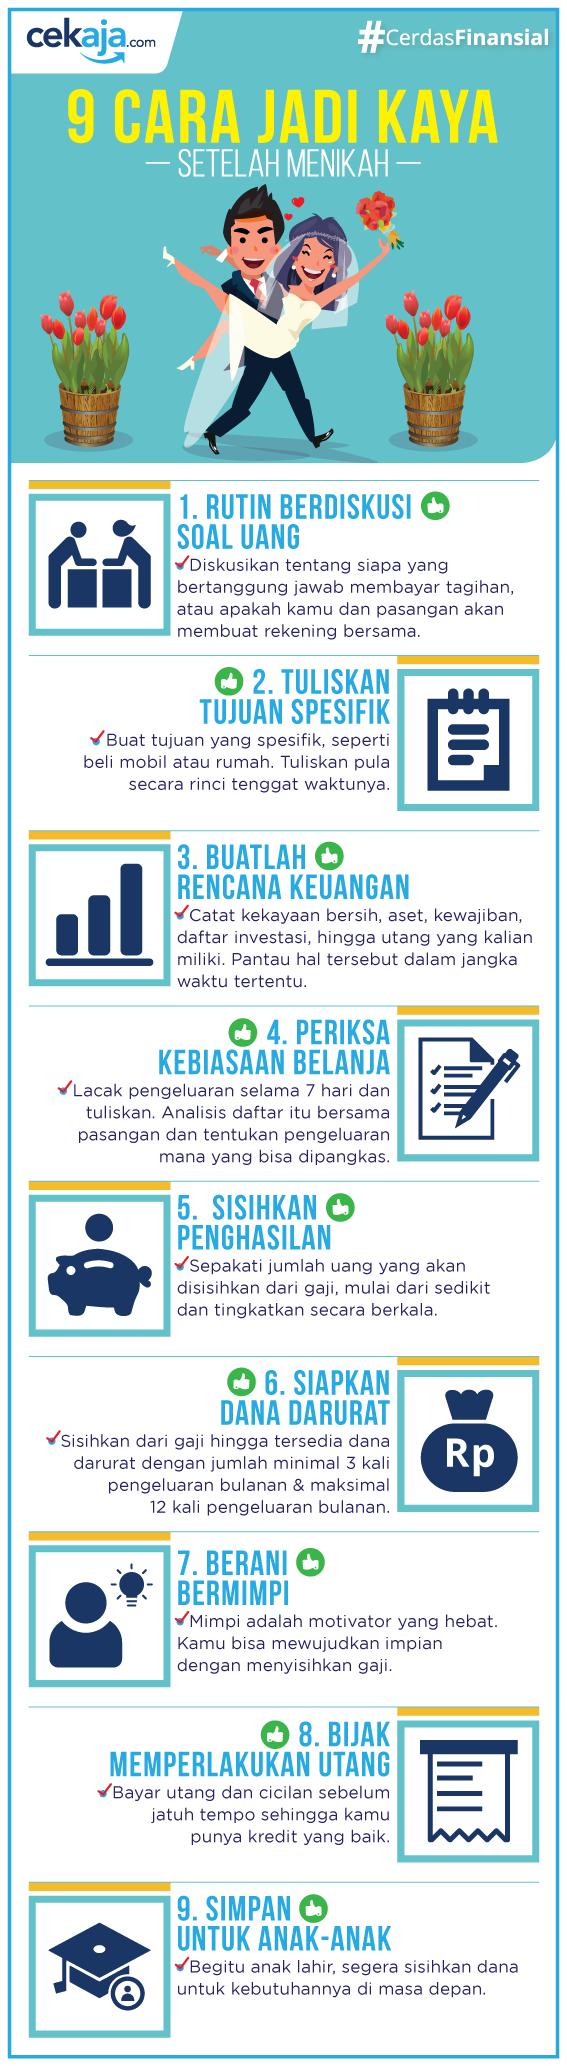 infografis-kaya setelah menikah - CekAja.com